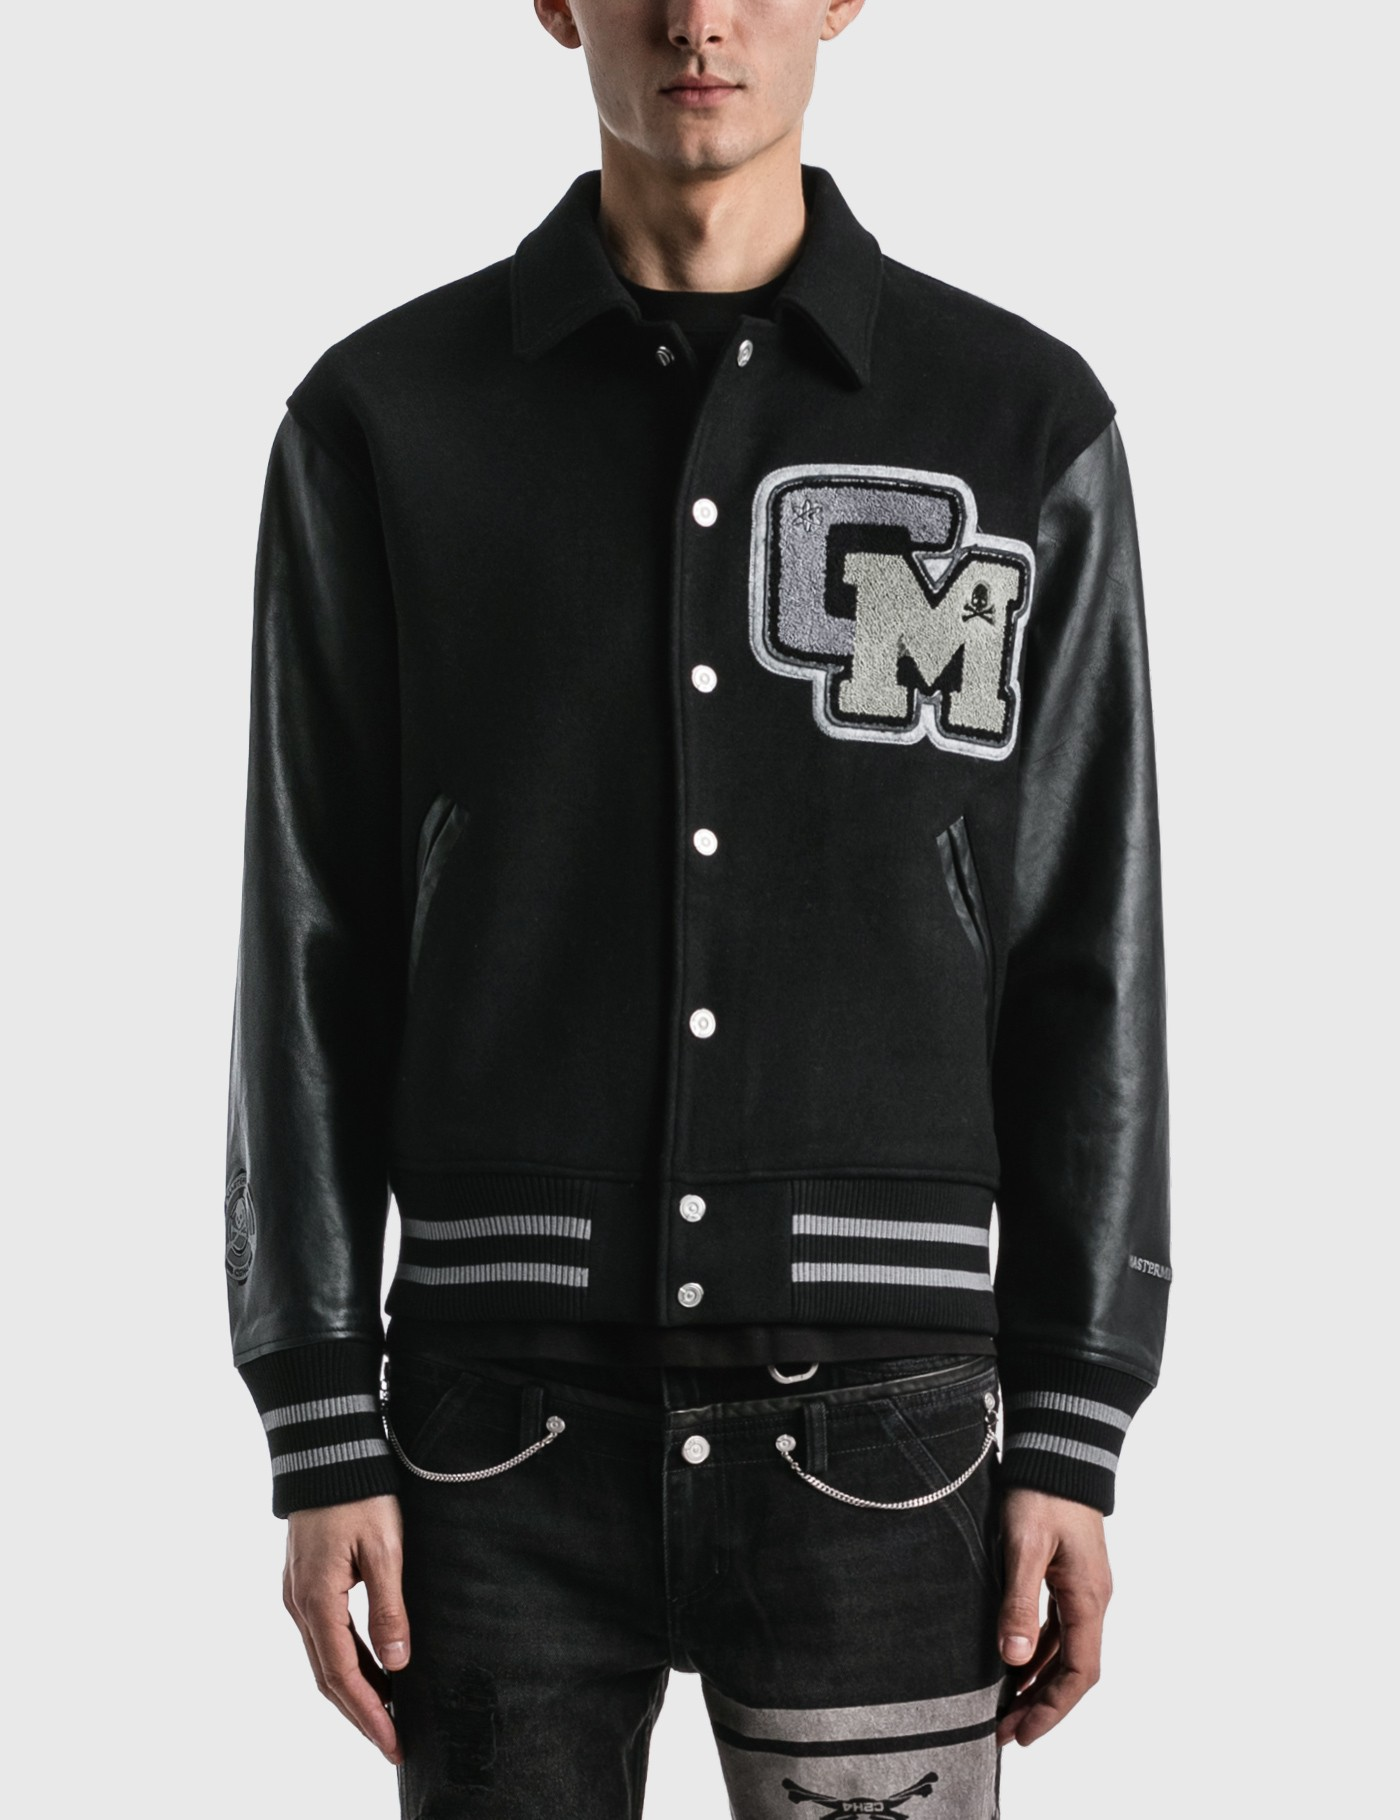 C2H4 x Mastermind Japan Applique Baseball Jacket